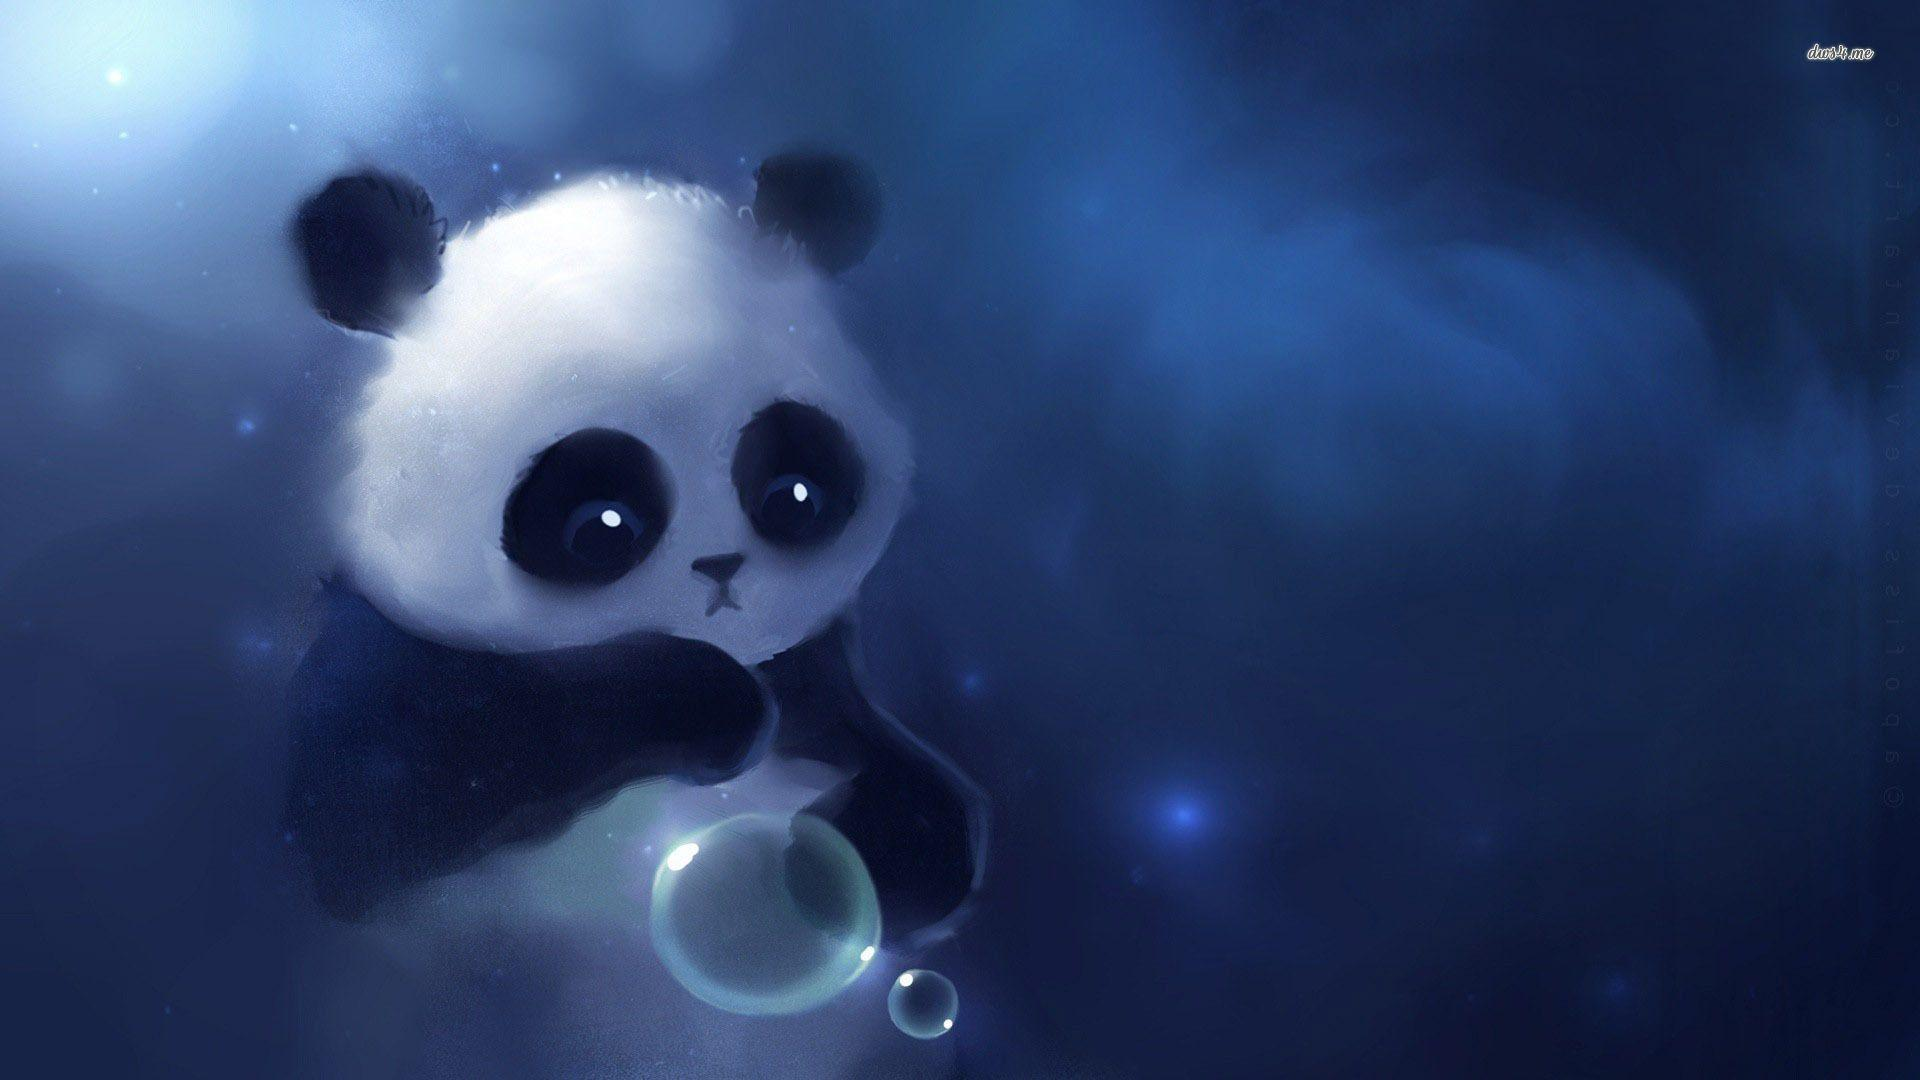 Wallpapers For Cute Panda Wallpaper Ipad